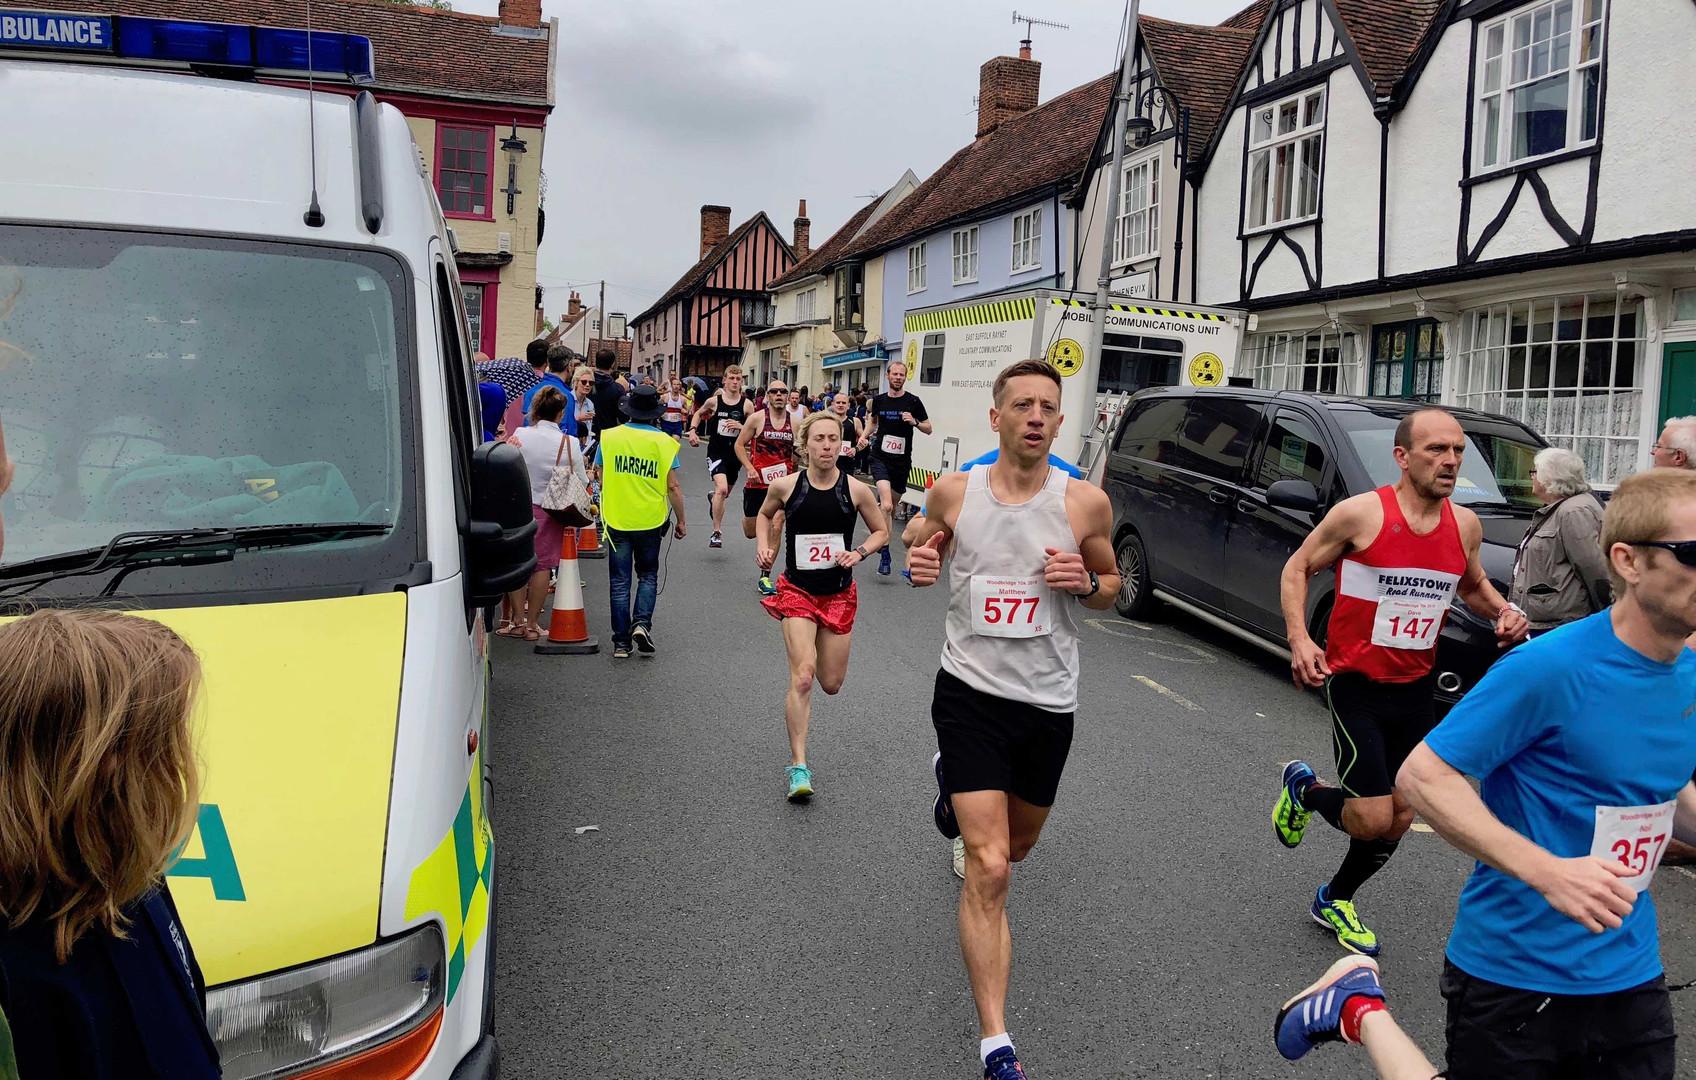 Running Event Ambulance